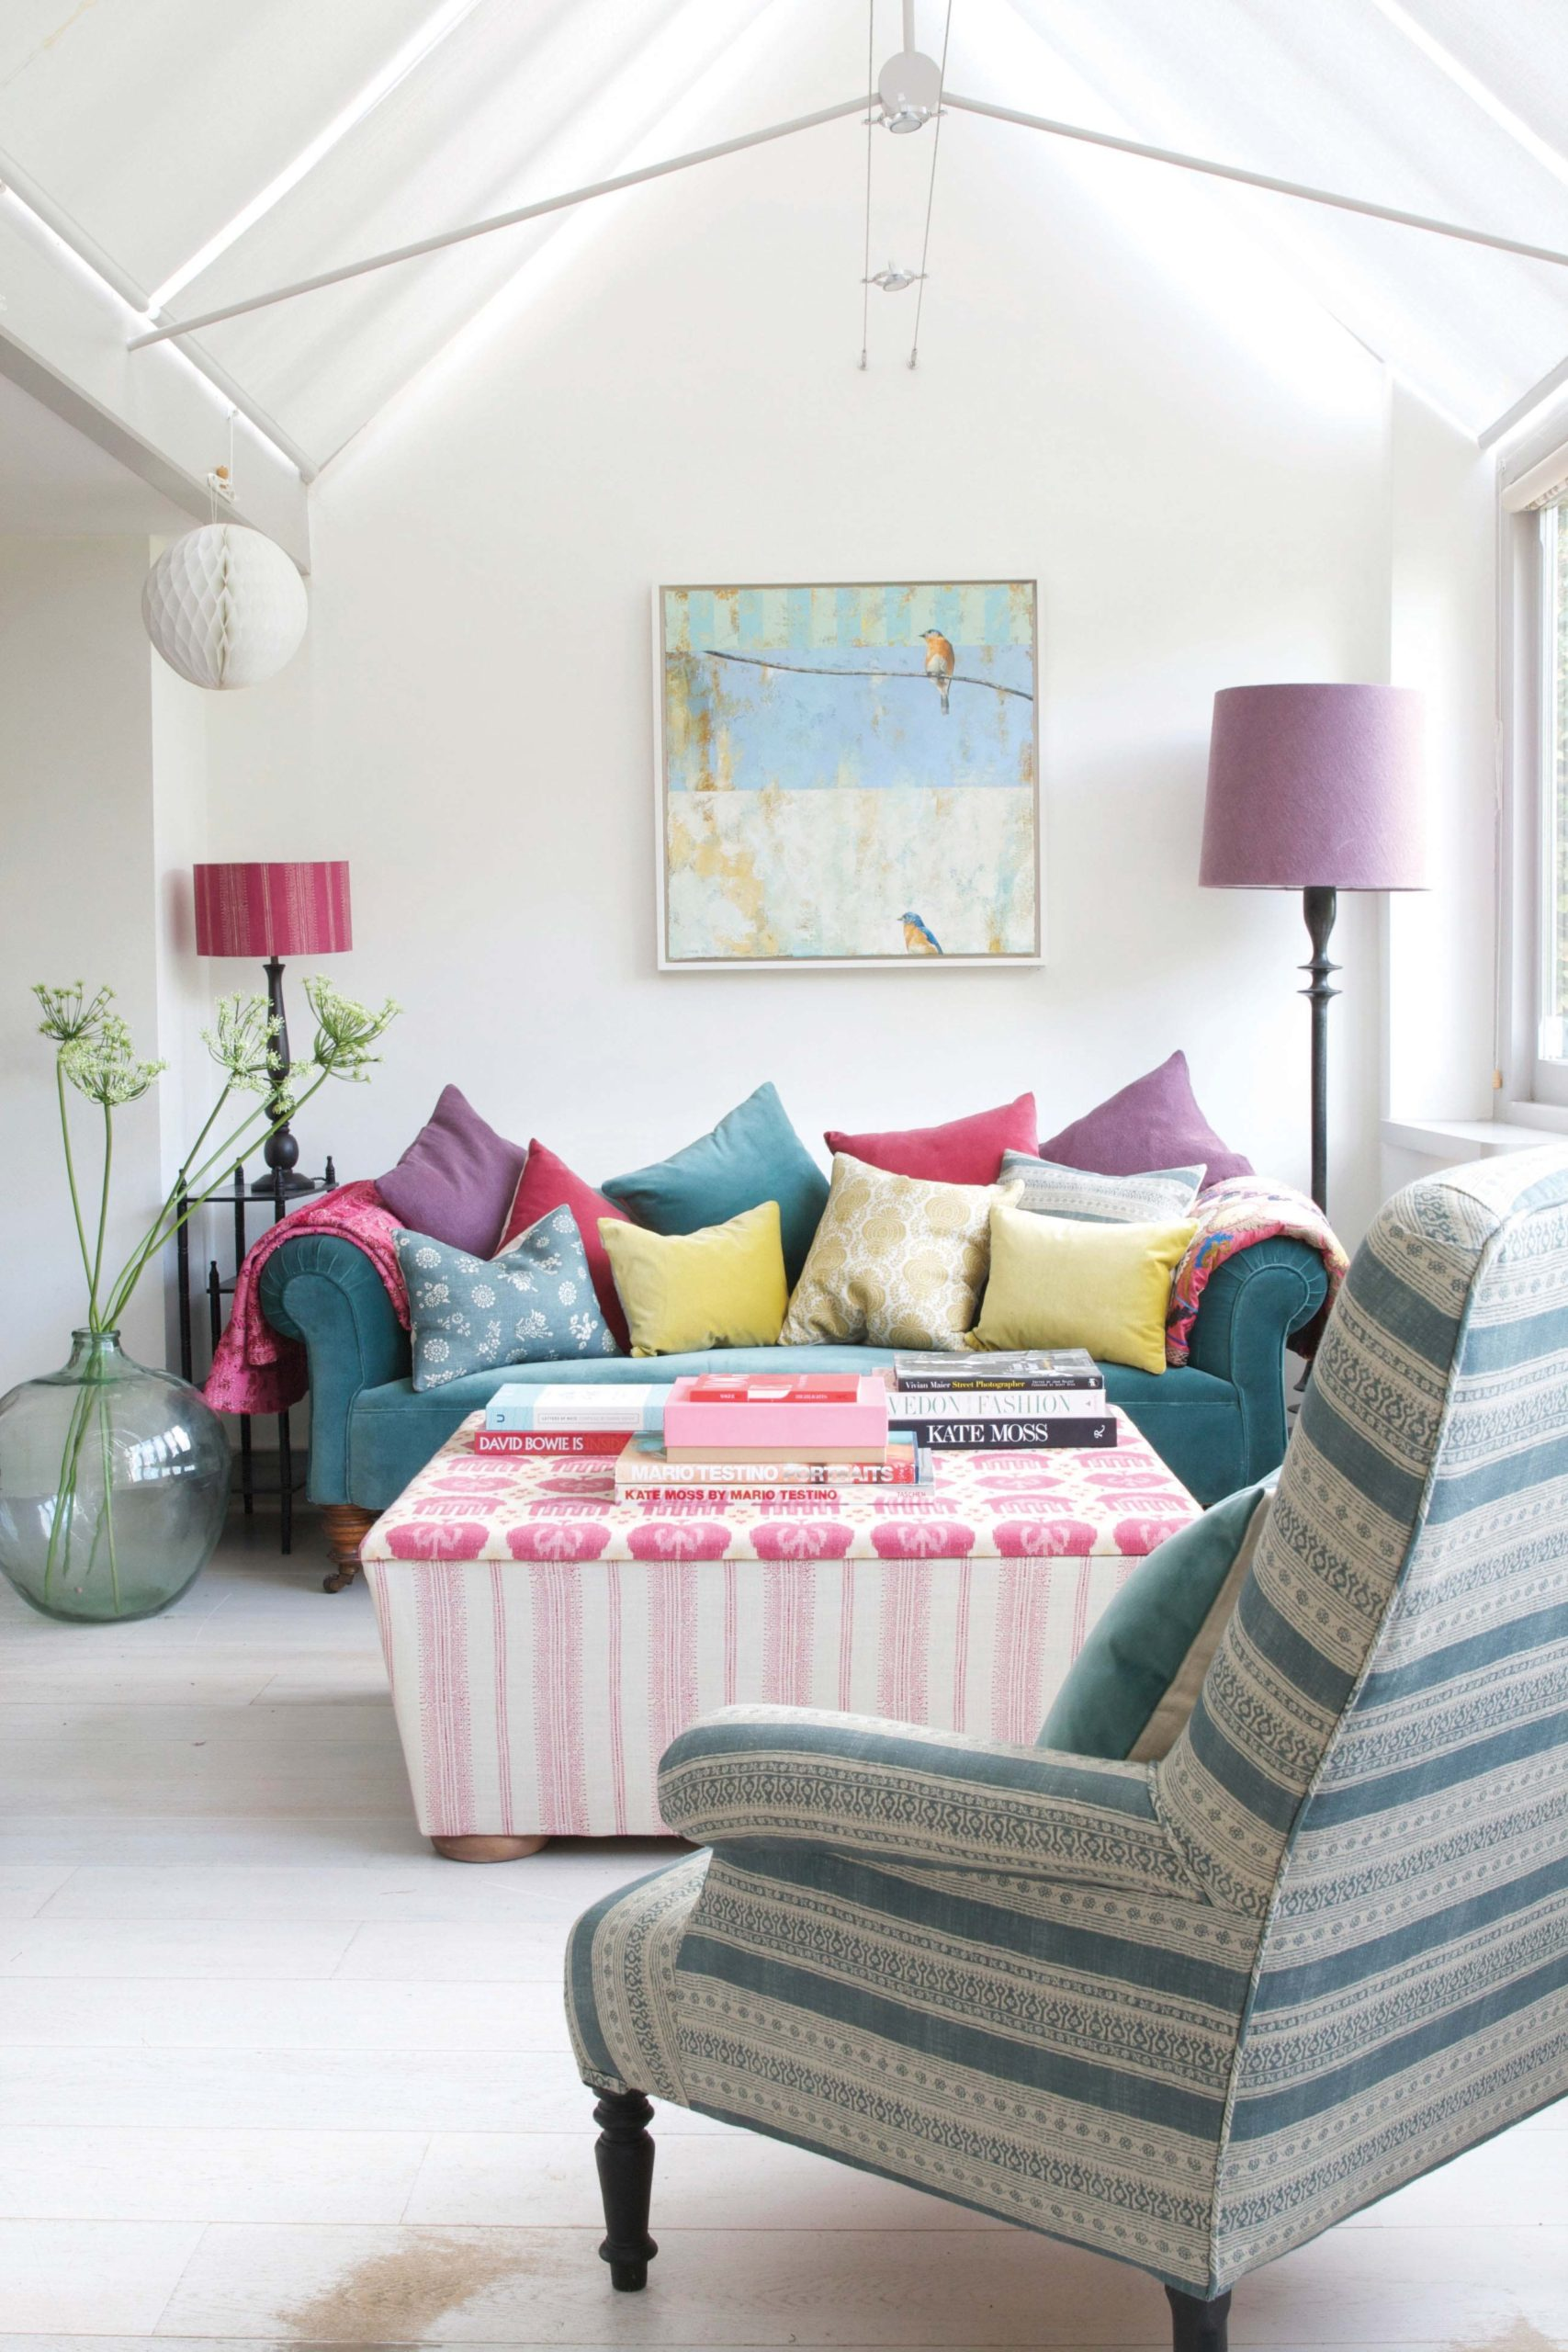 Kate Forman Ottoman & Cushions